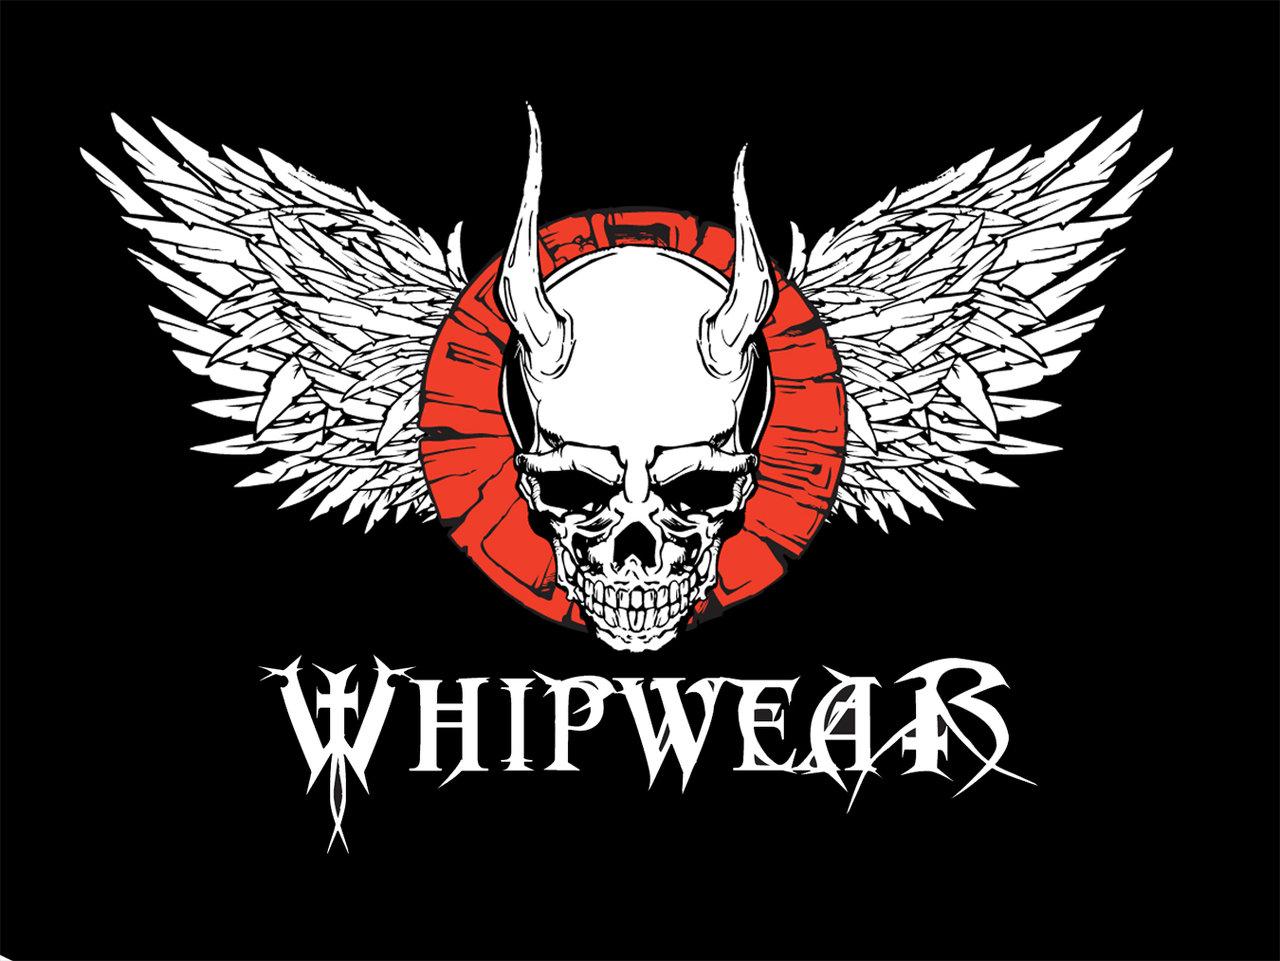 WhipWear